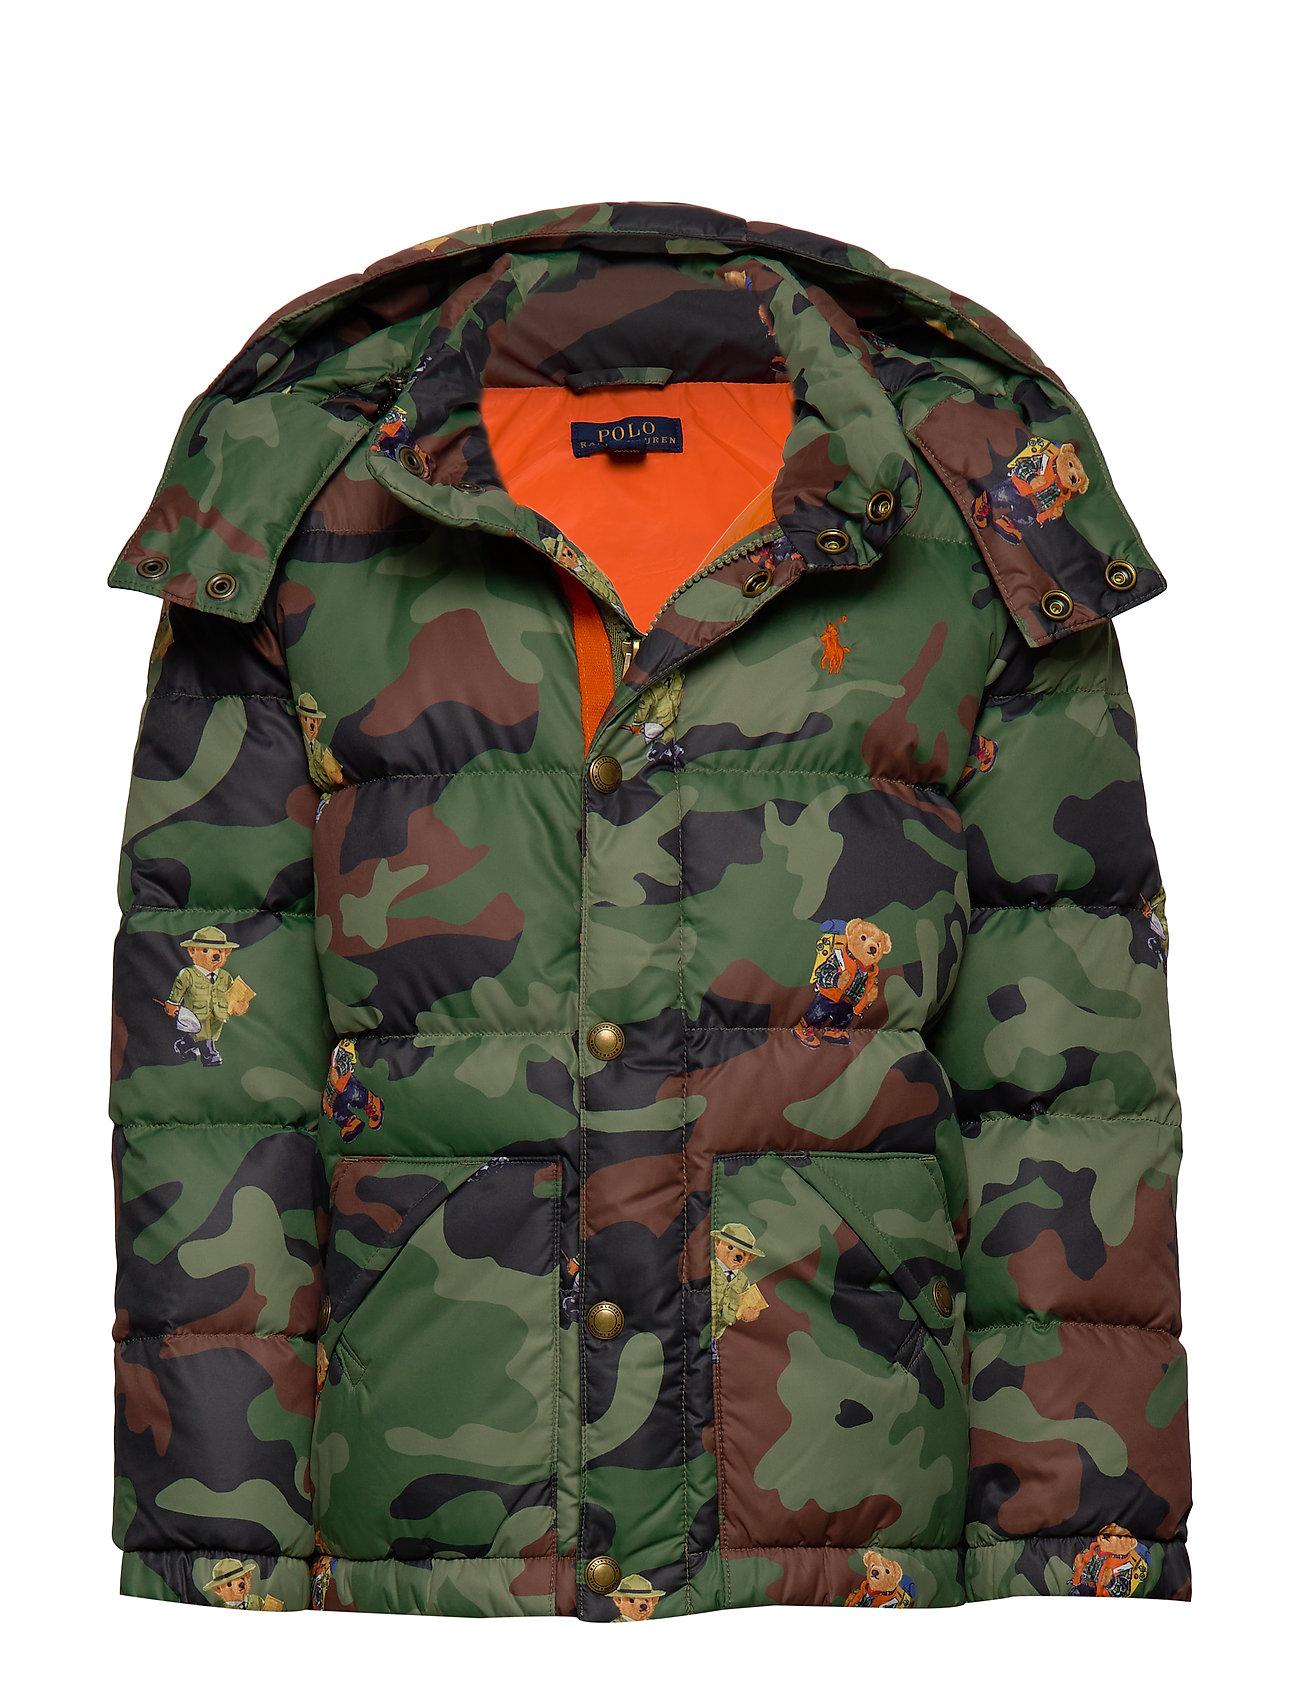 Ralph Lauren Kids Bear Camo Down Jacket - BEAR GRAPHIC PRIN